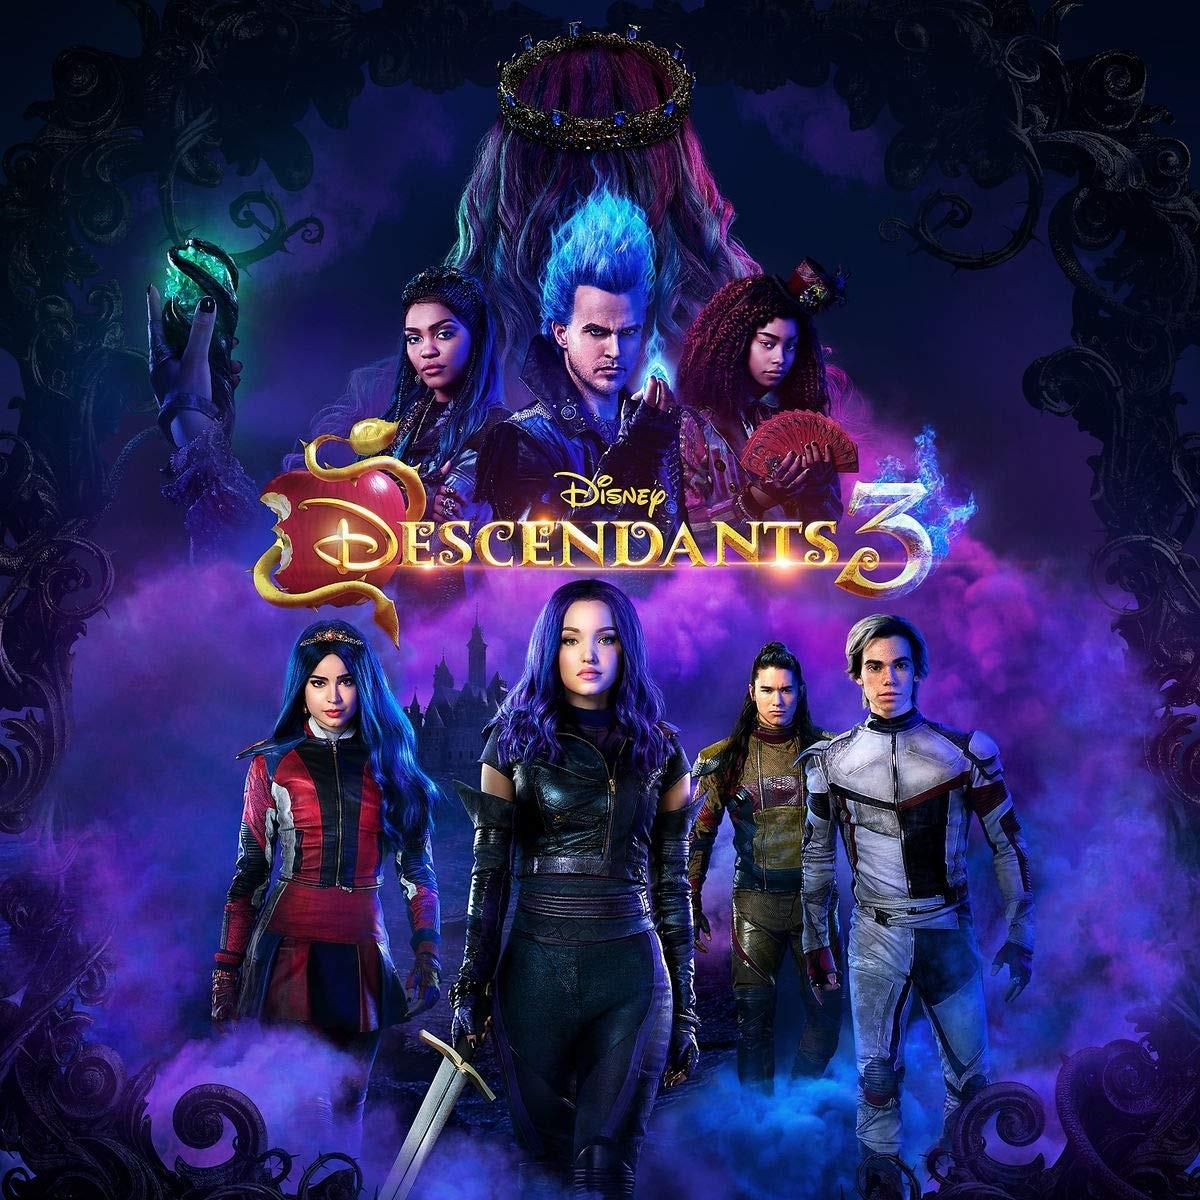 Descendentii 3 - Disney Descendants 3